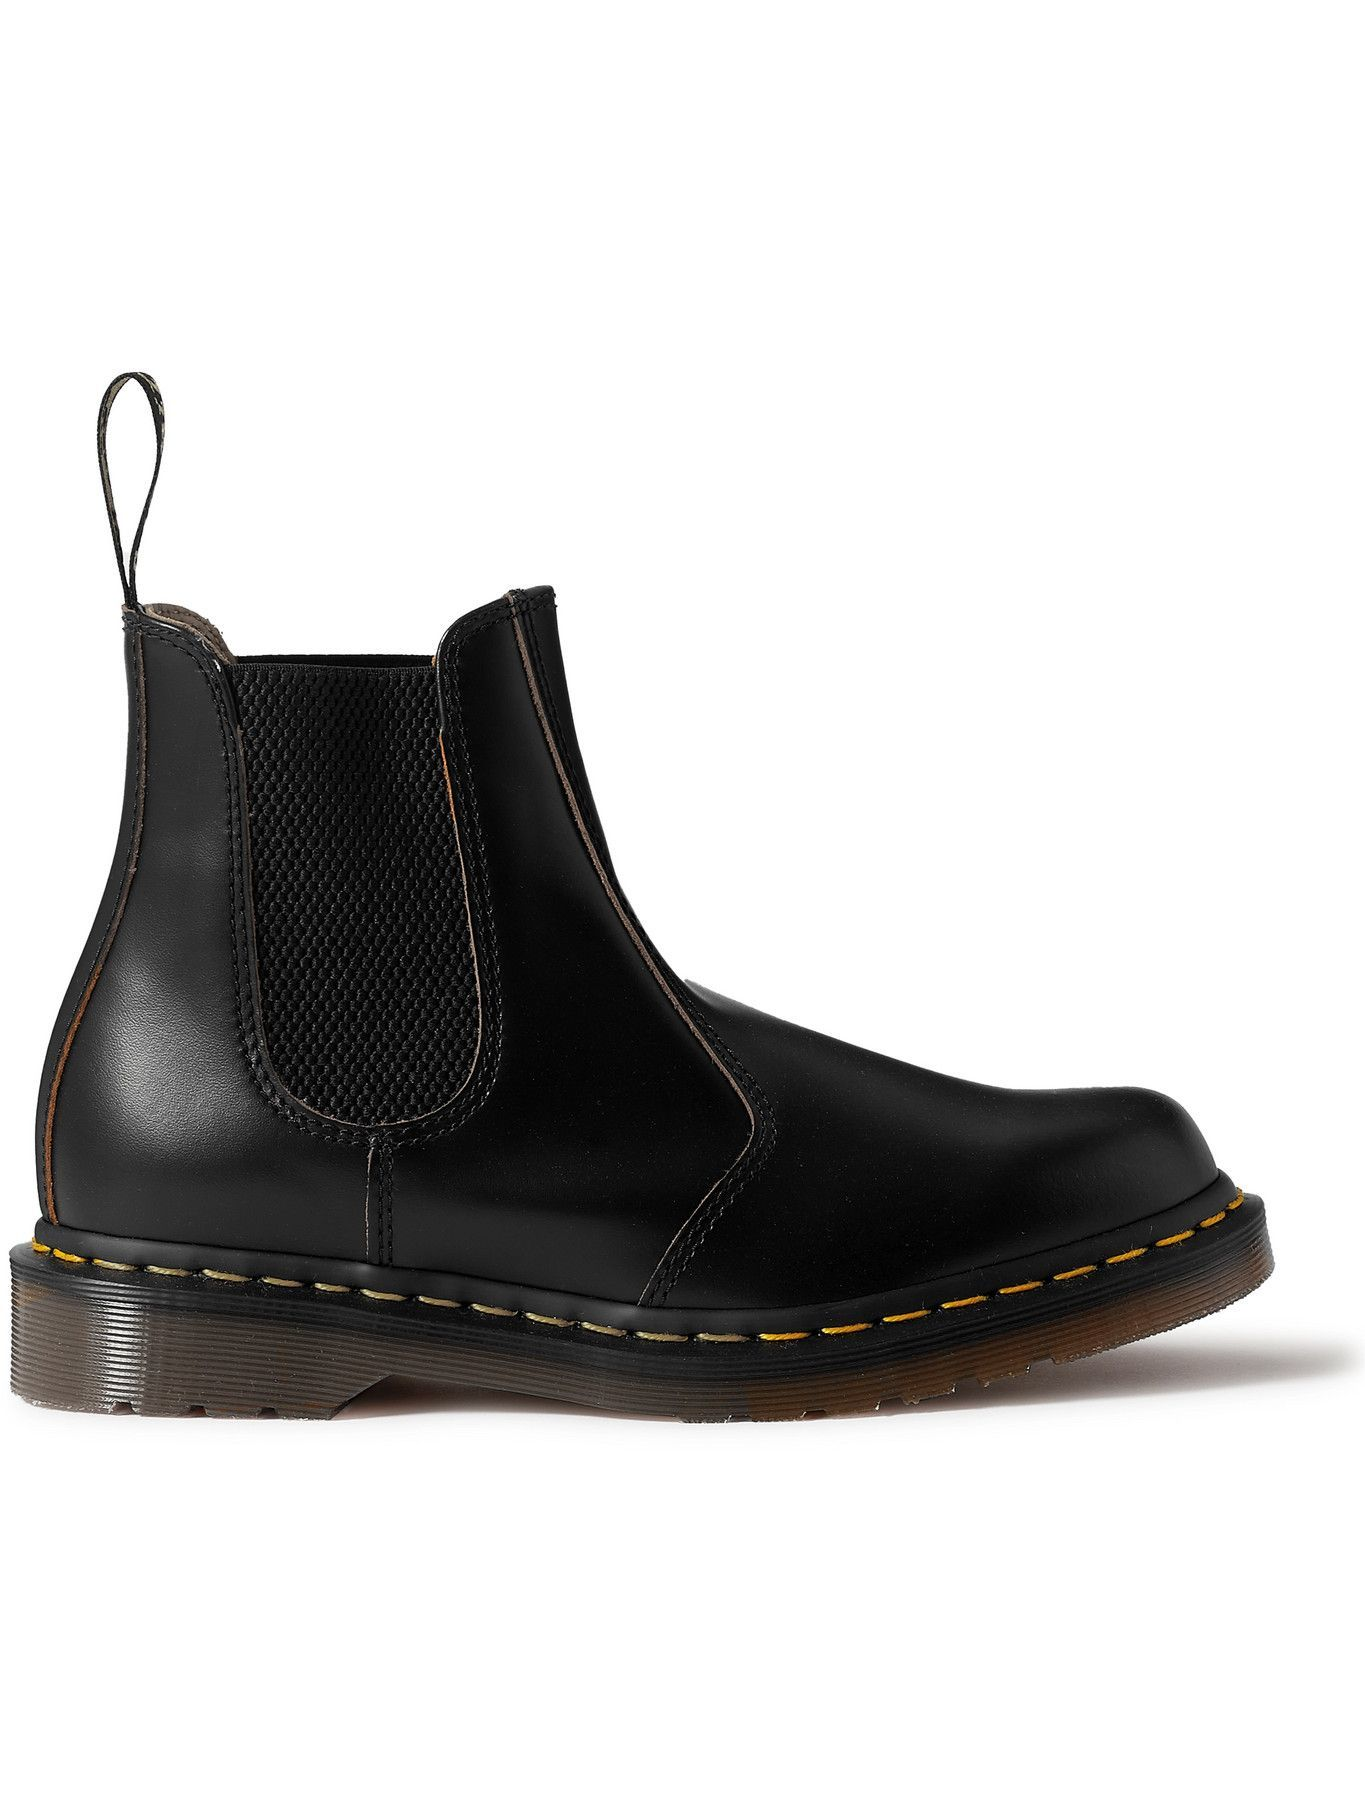 Photo: Dr. Martens - Vintage 2976 Leather Chelsea Boots - Black